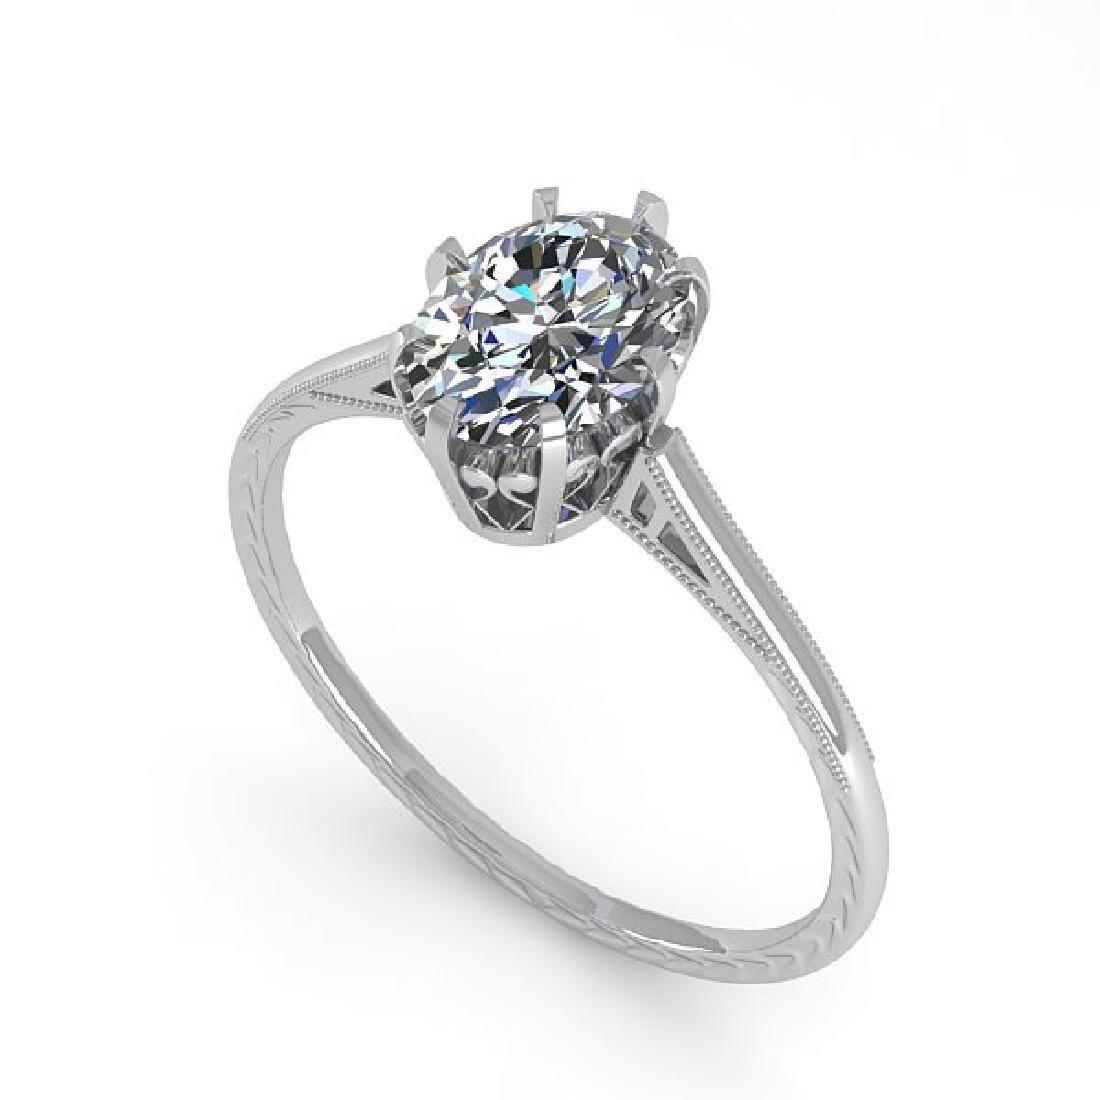 1.0 CTW VS/SI Oval Diamond Solitaire Ring 14K White - 2